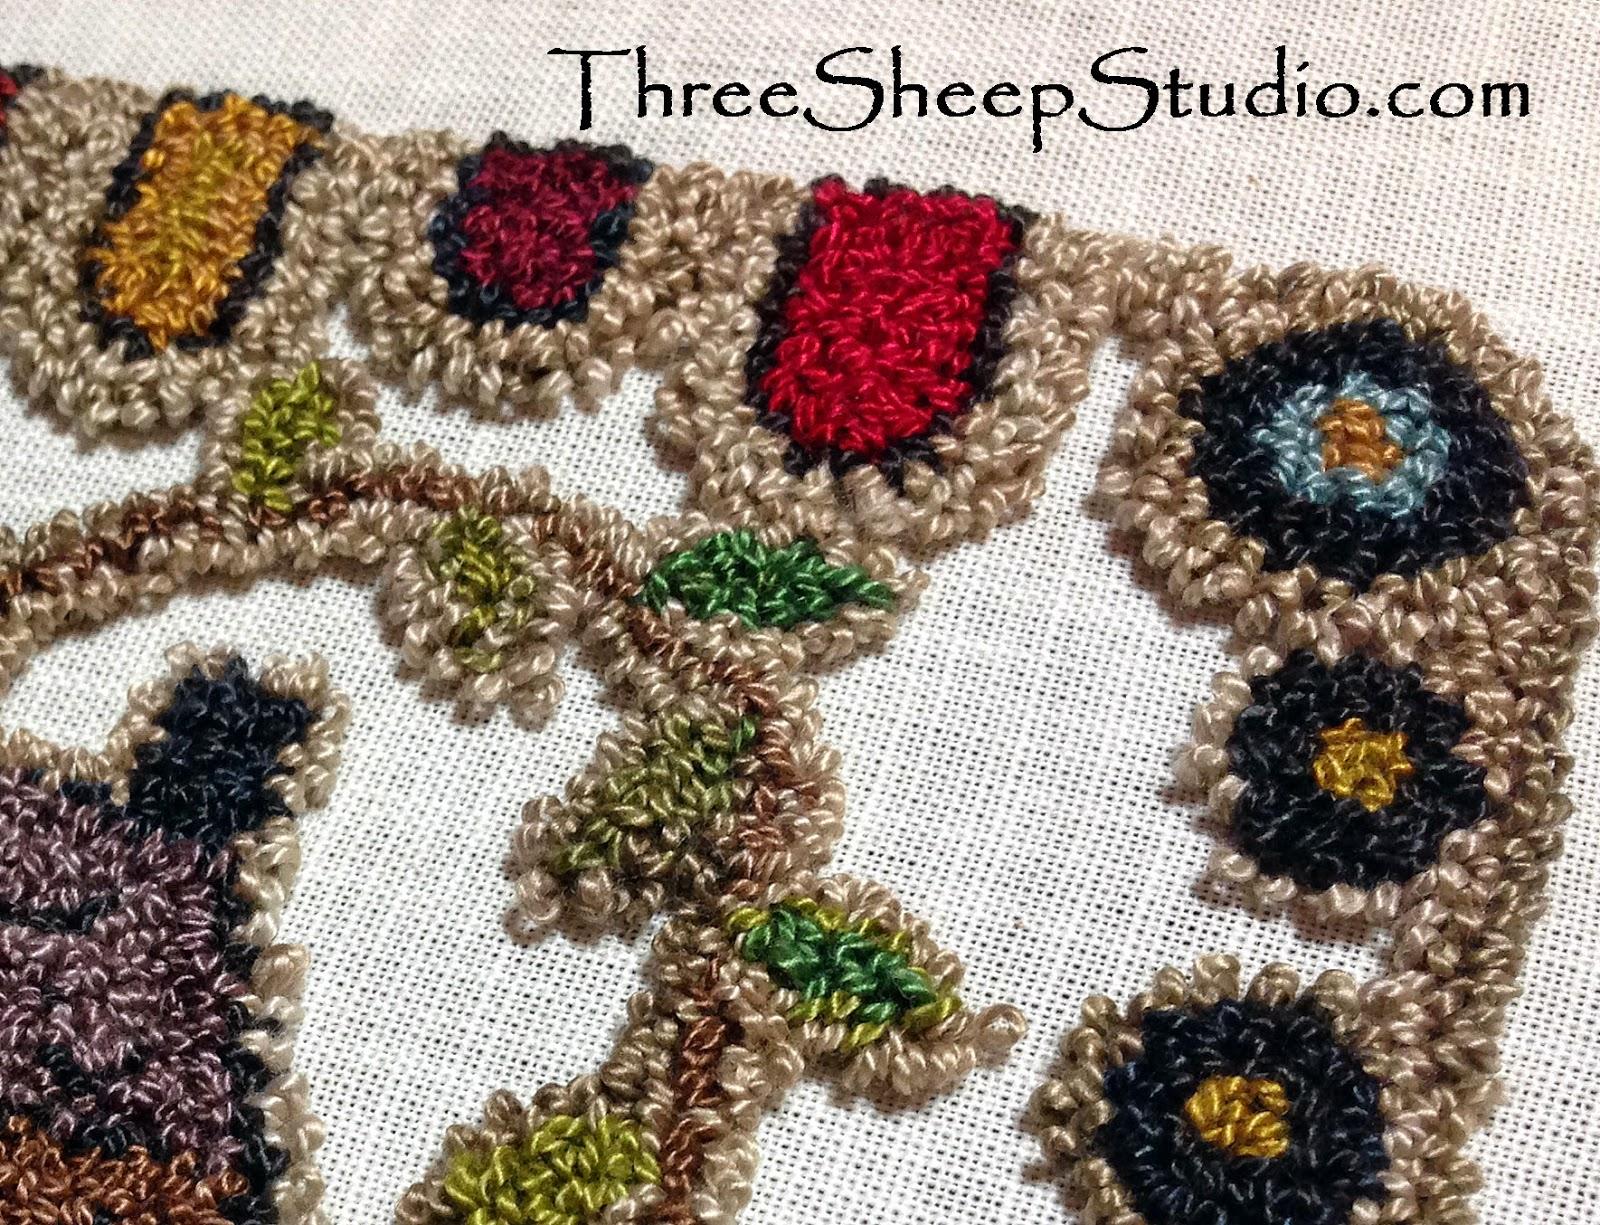 Punchneedle design using Valdani variegated Perle Cotton Thread - ThreeSheepStudio.com